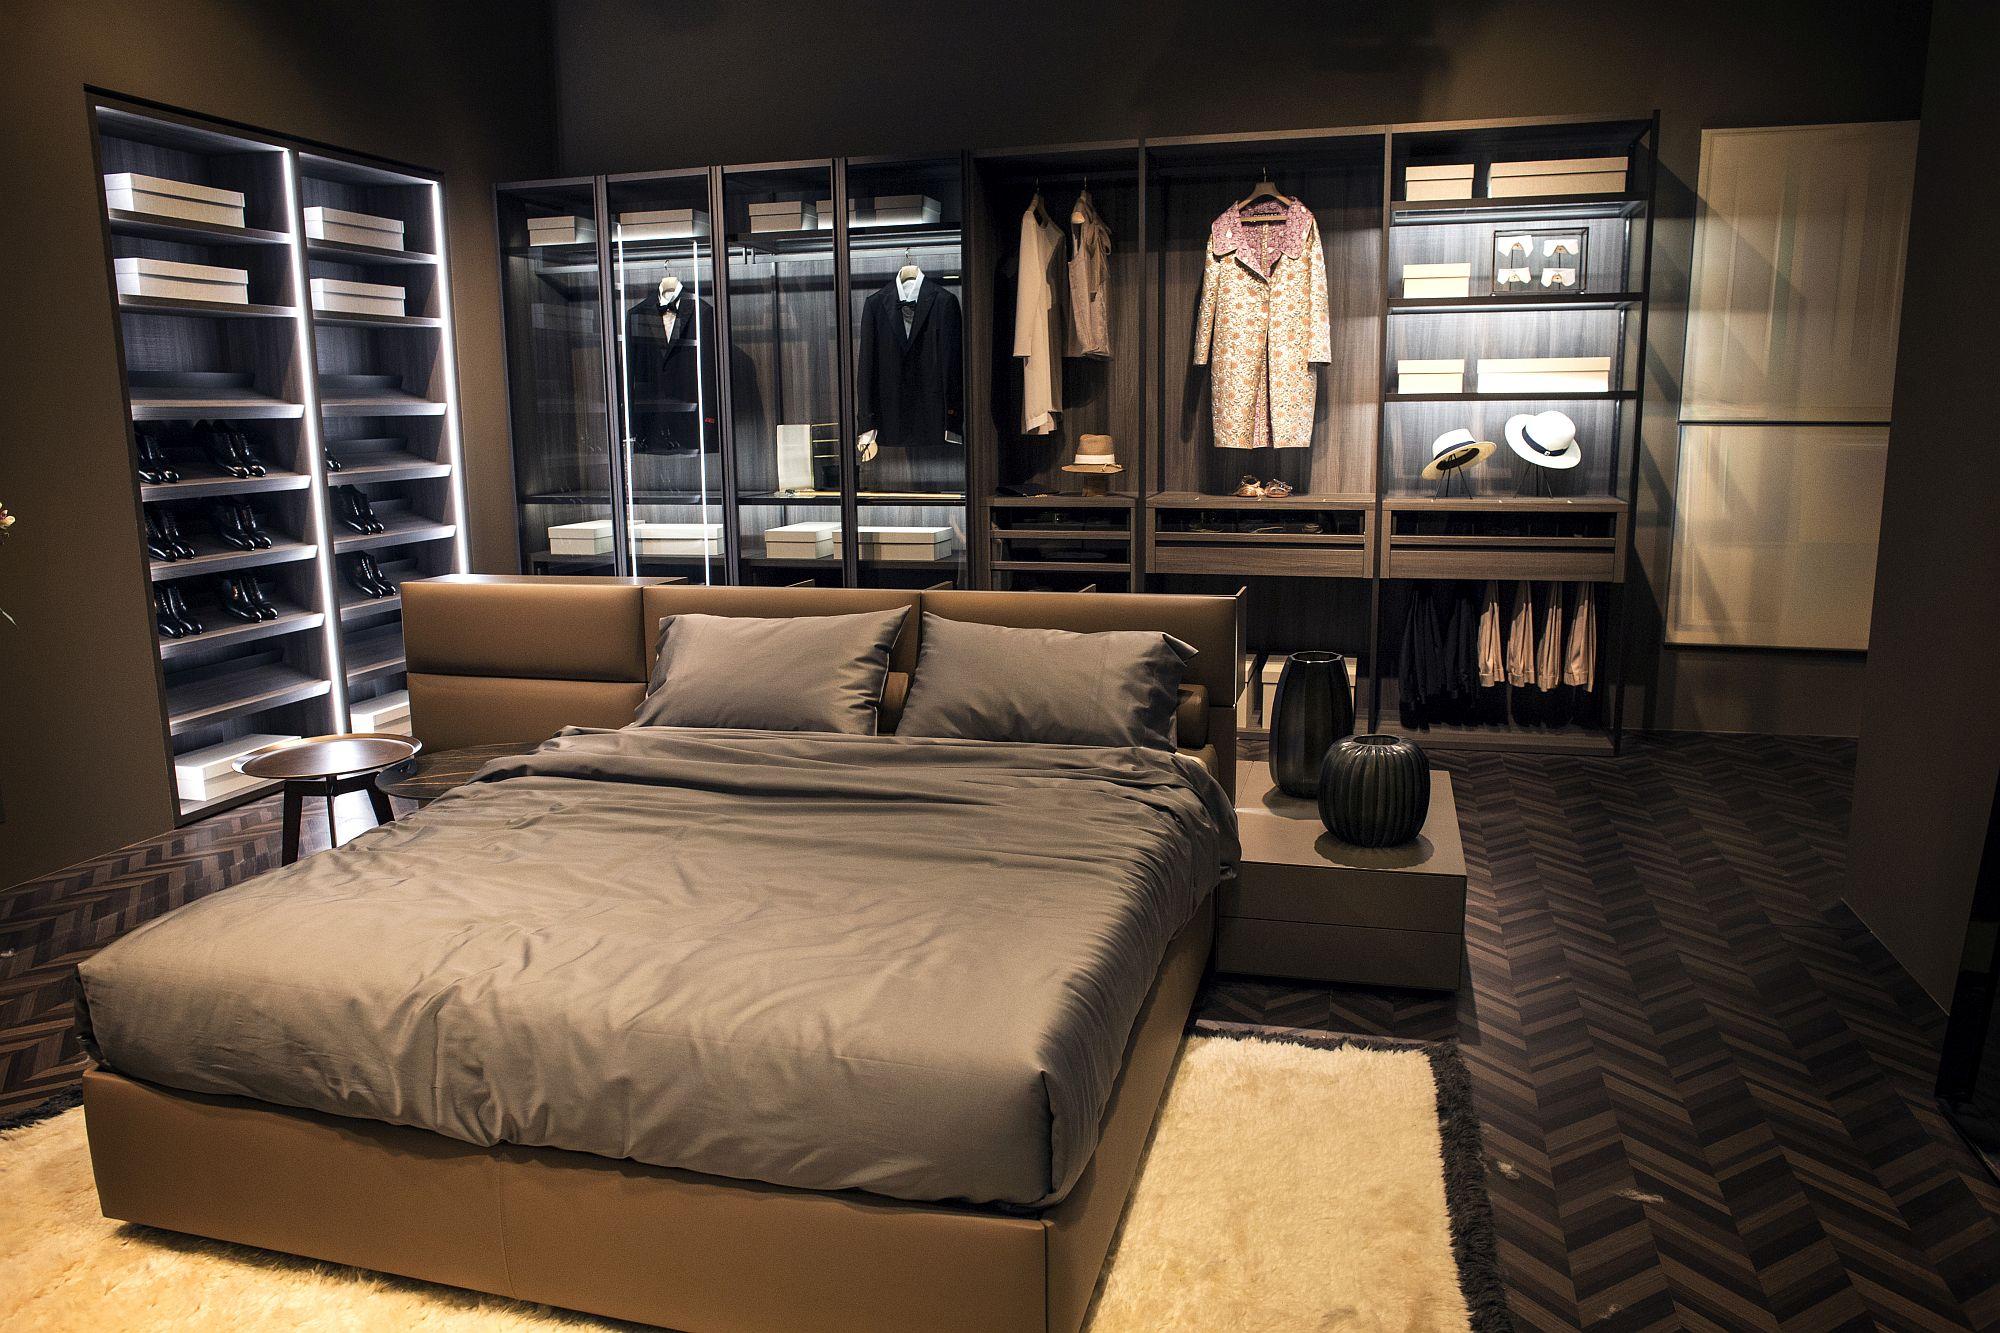 An Organized Wardrobe 15 SpaceSavvy and Stylish Closet Ideas